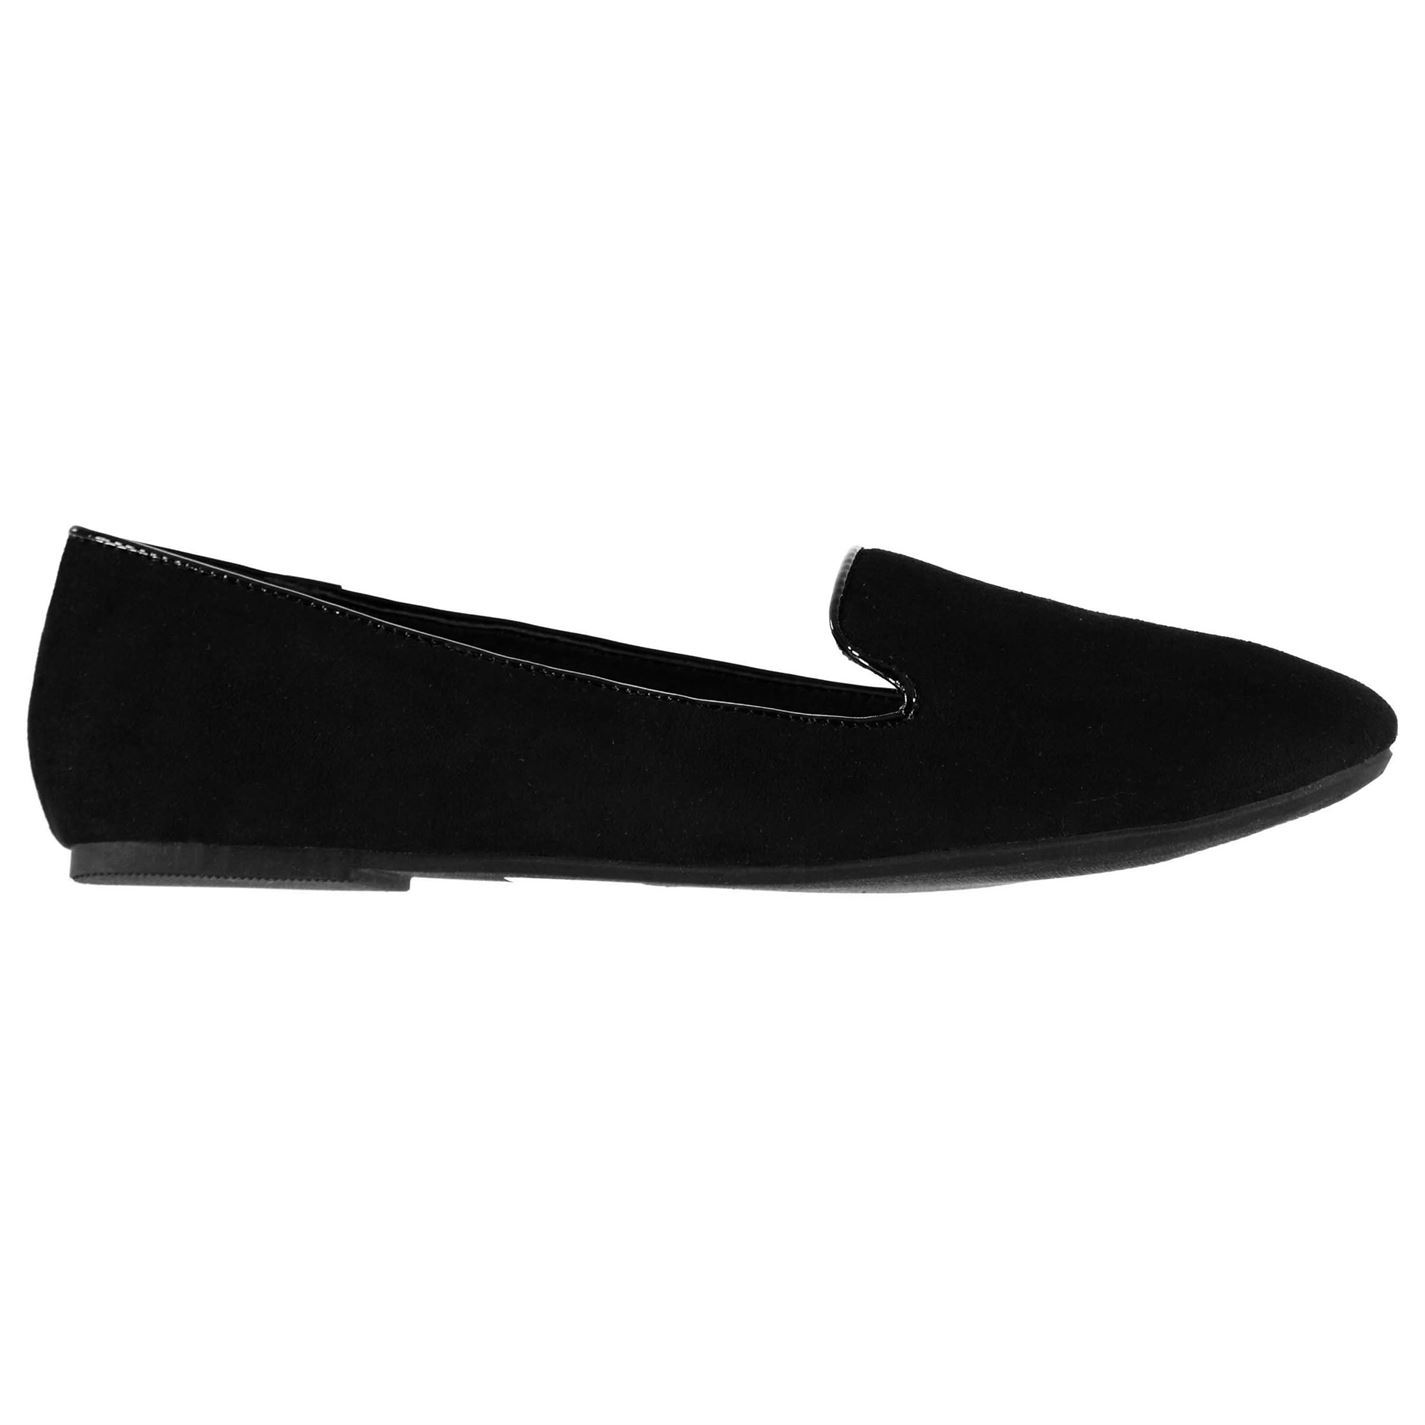 Miso-Womens-Sassy-Slipper-Shoes-Slip-On-Plain-